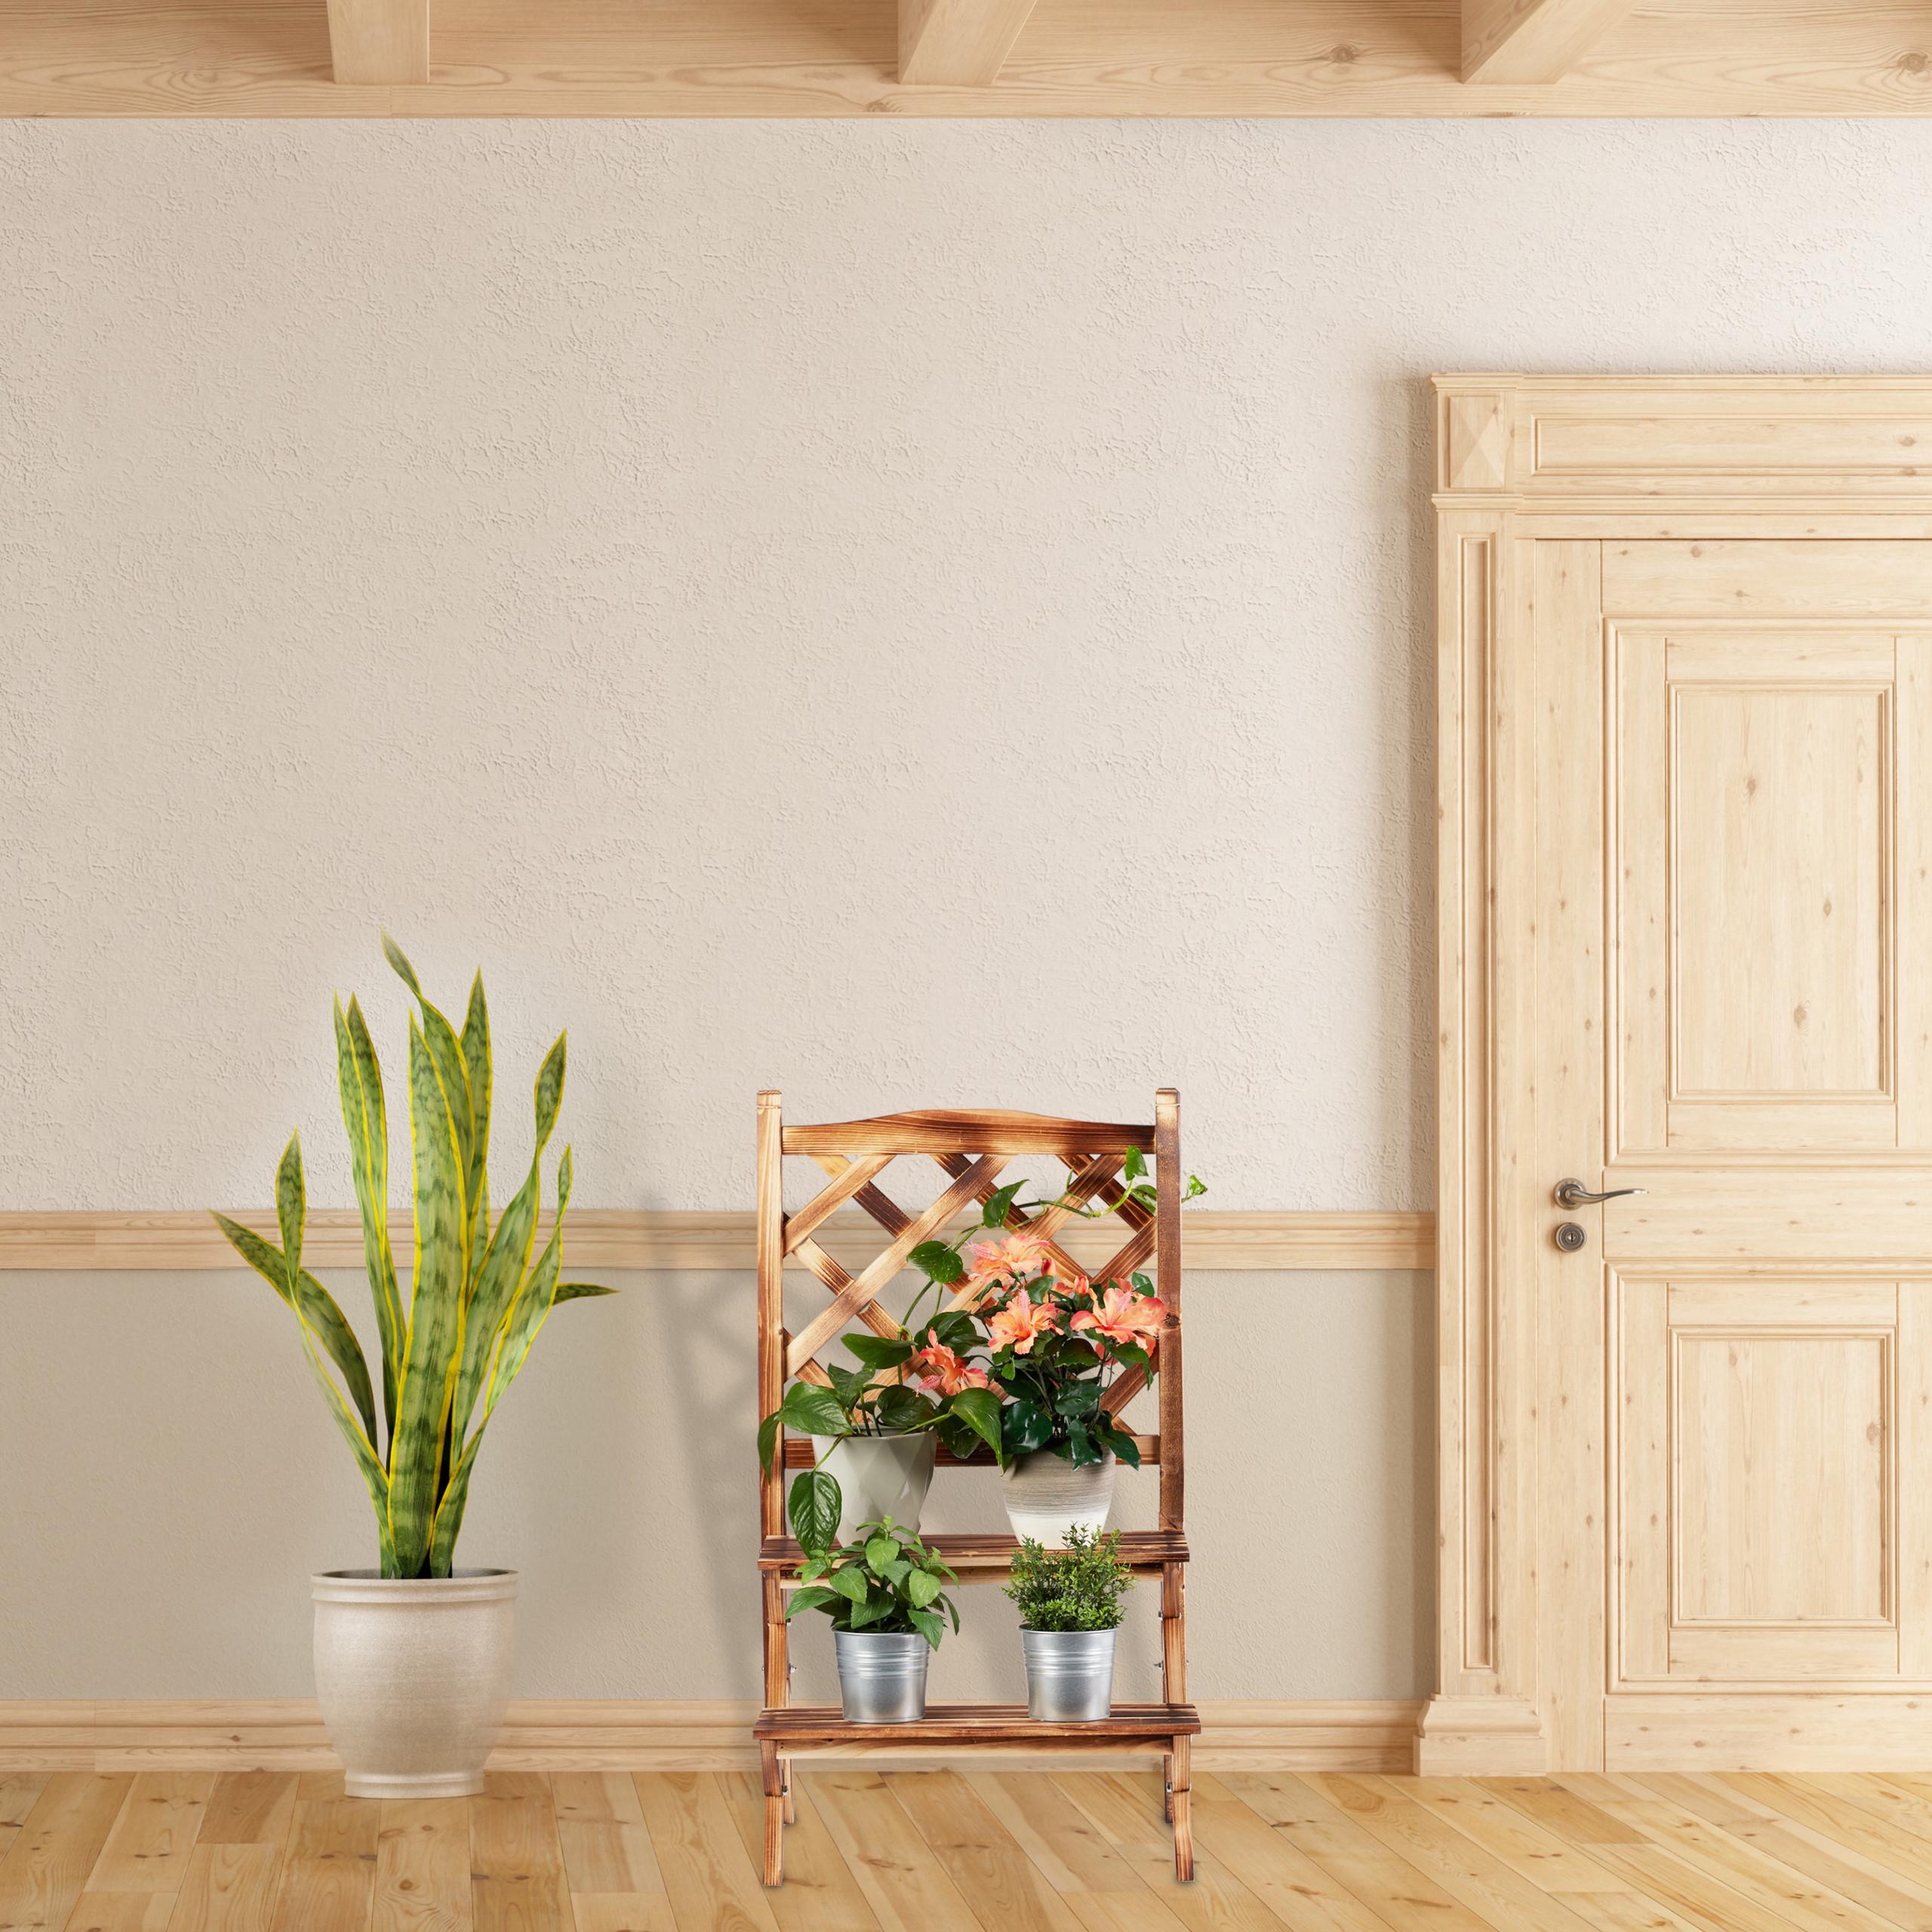 plantenrek-hout-plantentrap-plantenklimrek-bloemenrek-bloementrap miniatuur 6